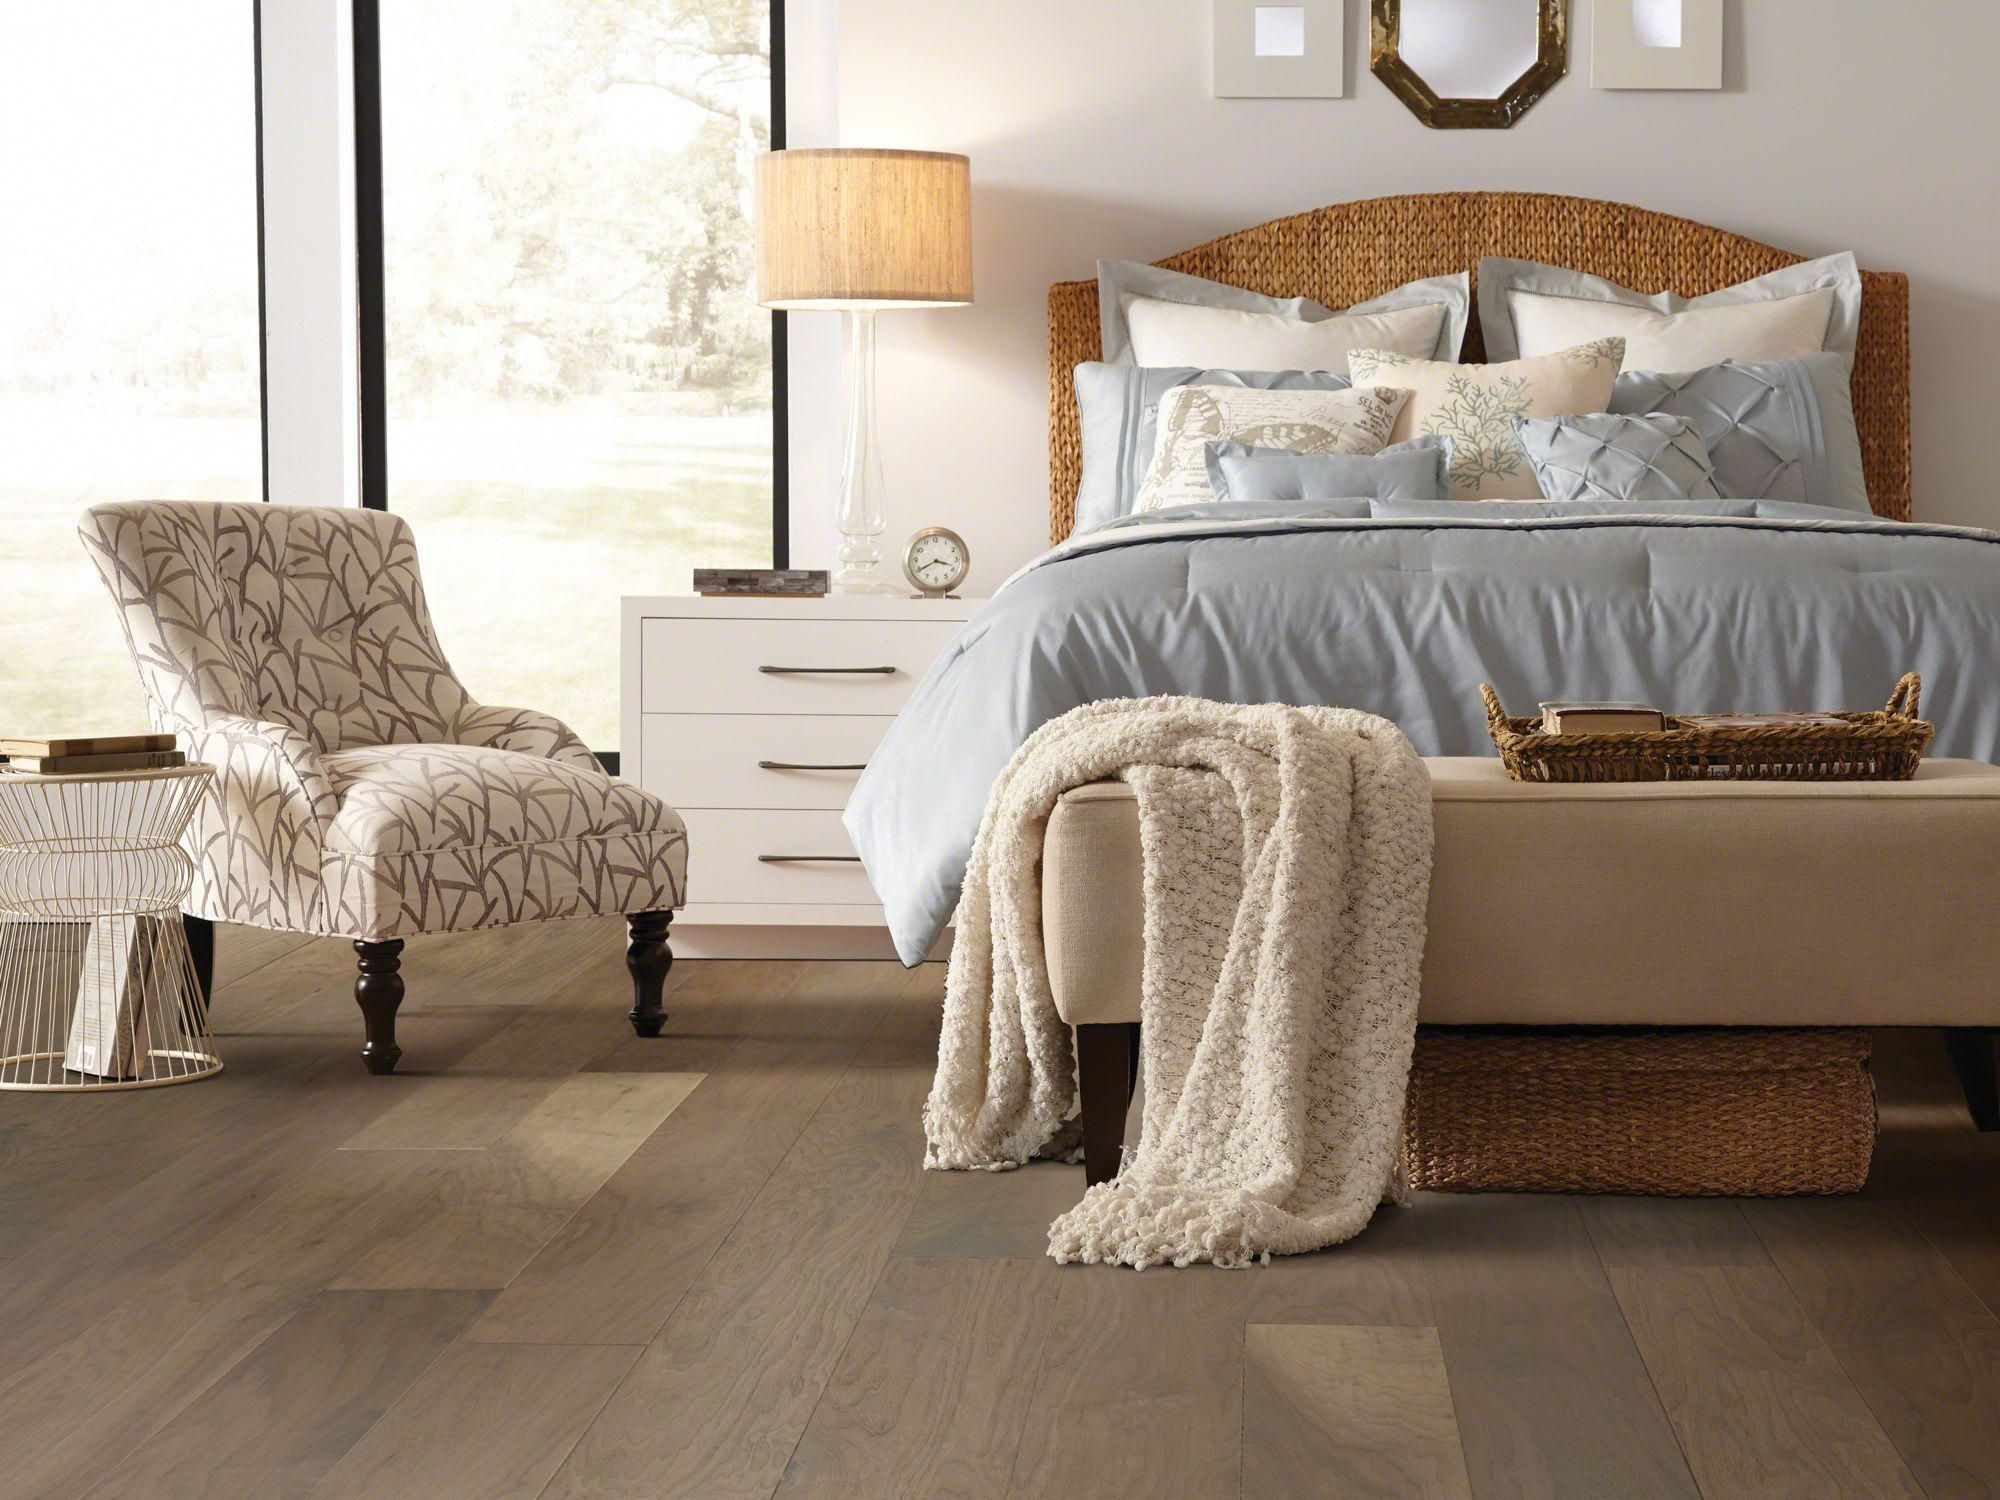 Shaw Engineered Hardwood Flooring Reviews in 2020